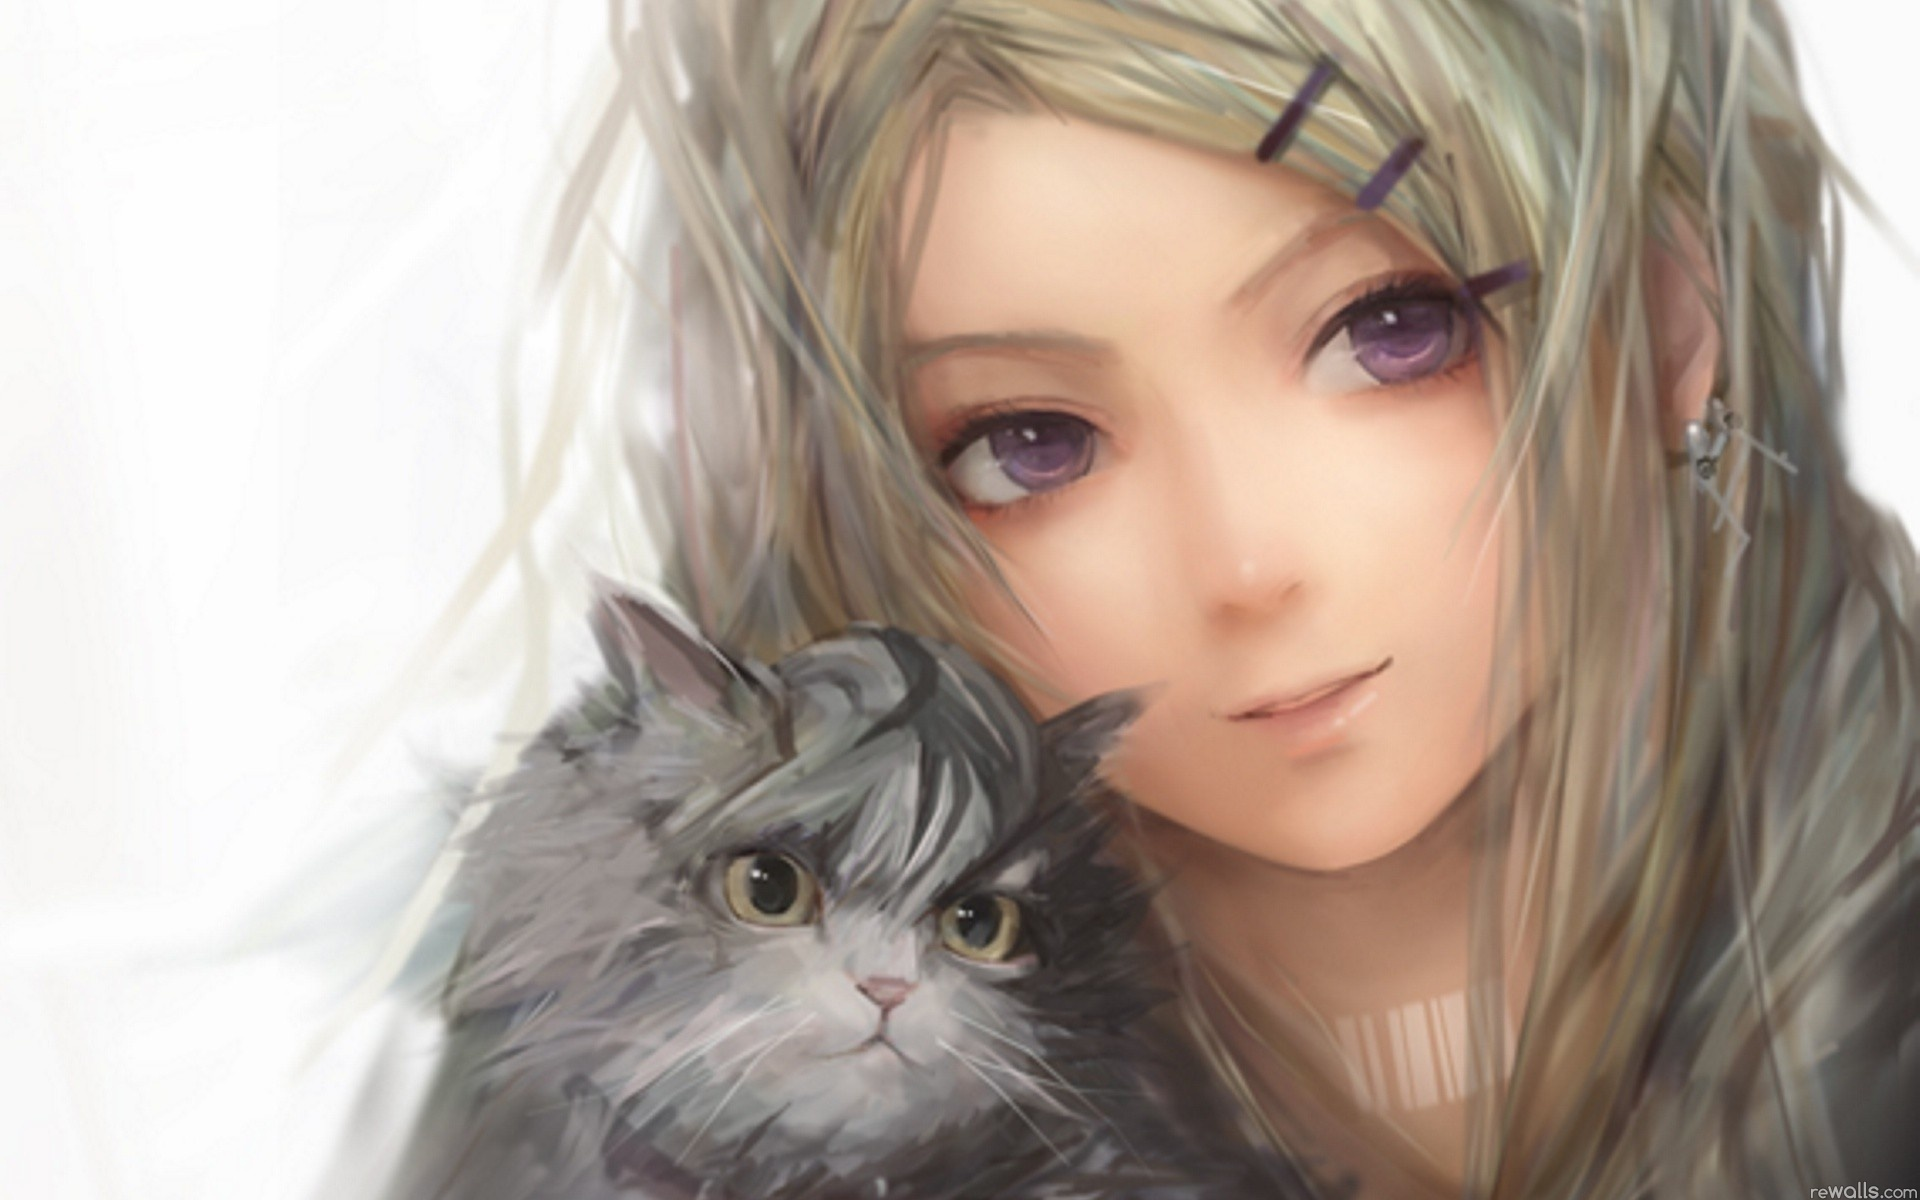 девушка котенок лицо взгляд  № 3597603 бесплатно